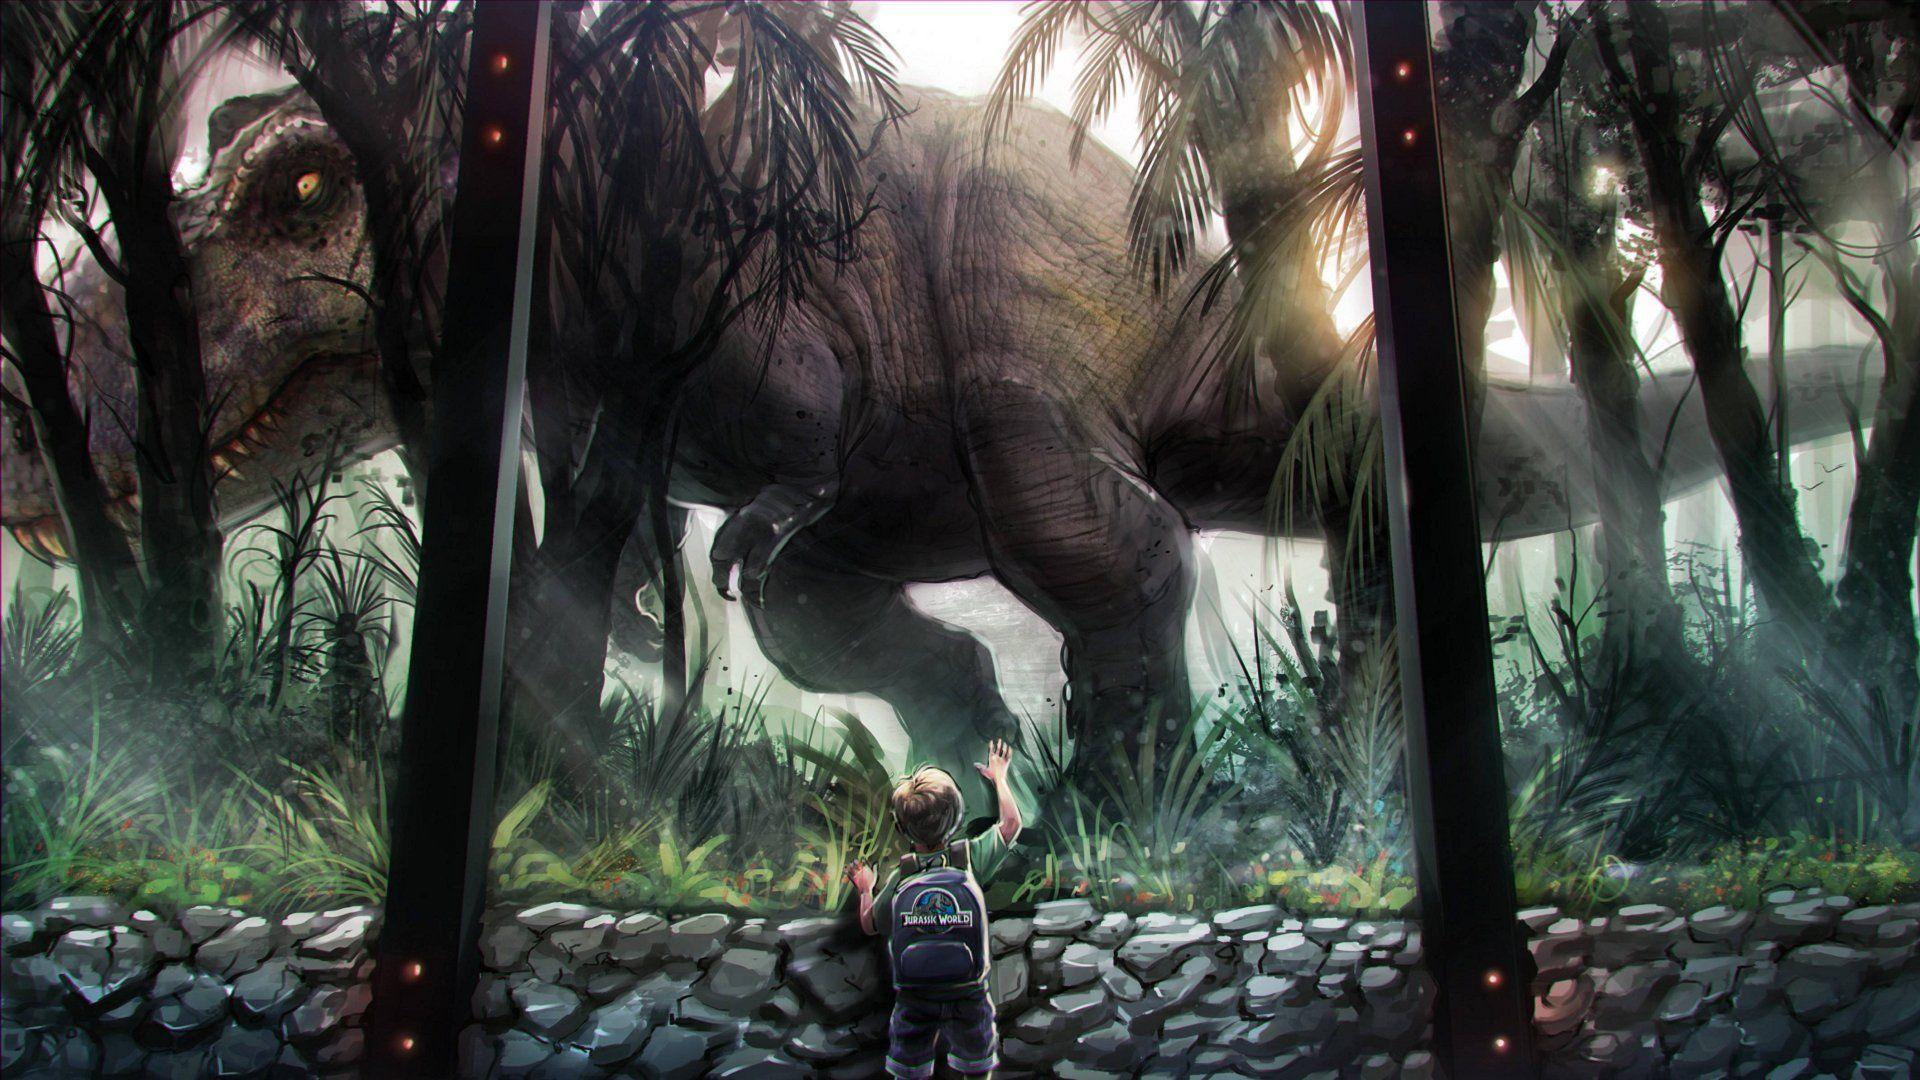 Velociraptor desktop wallpaper google search dinosaurs - Jurassic park phone wallpaper ...